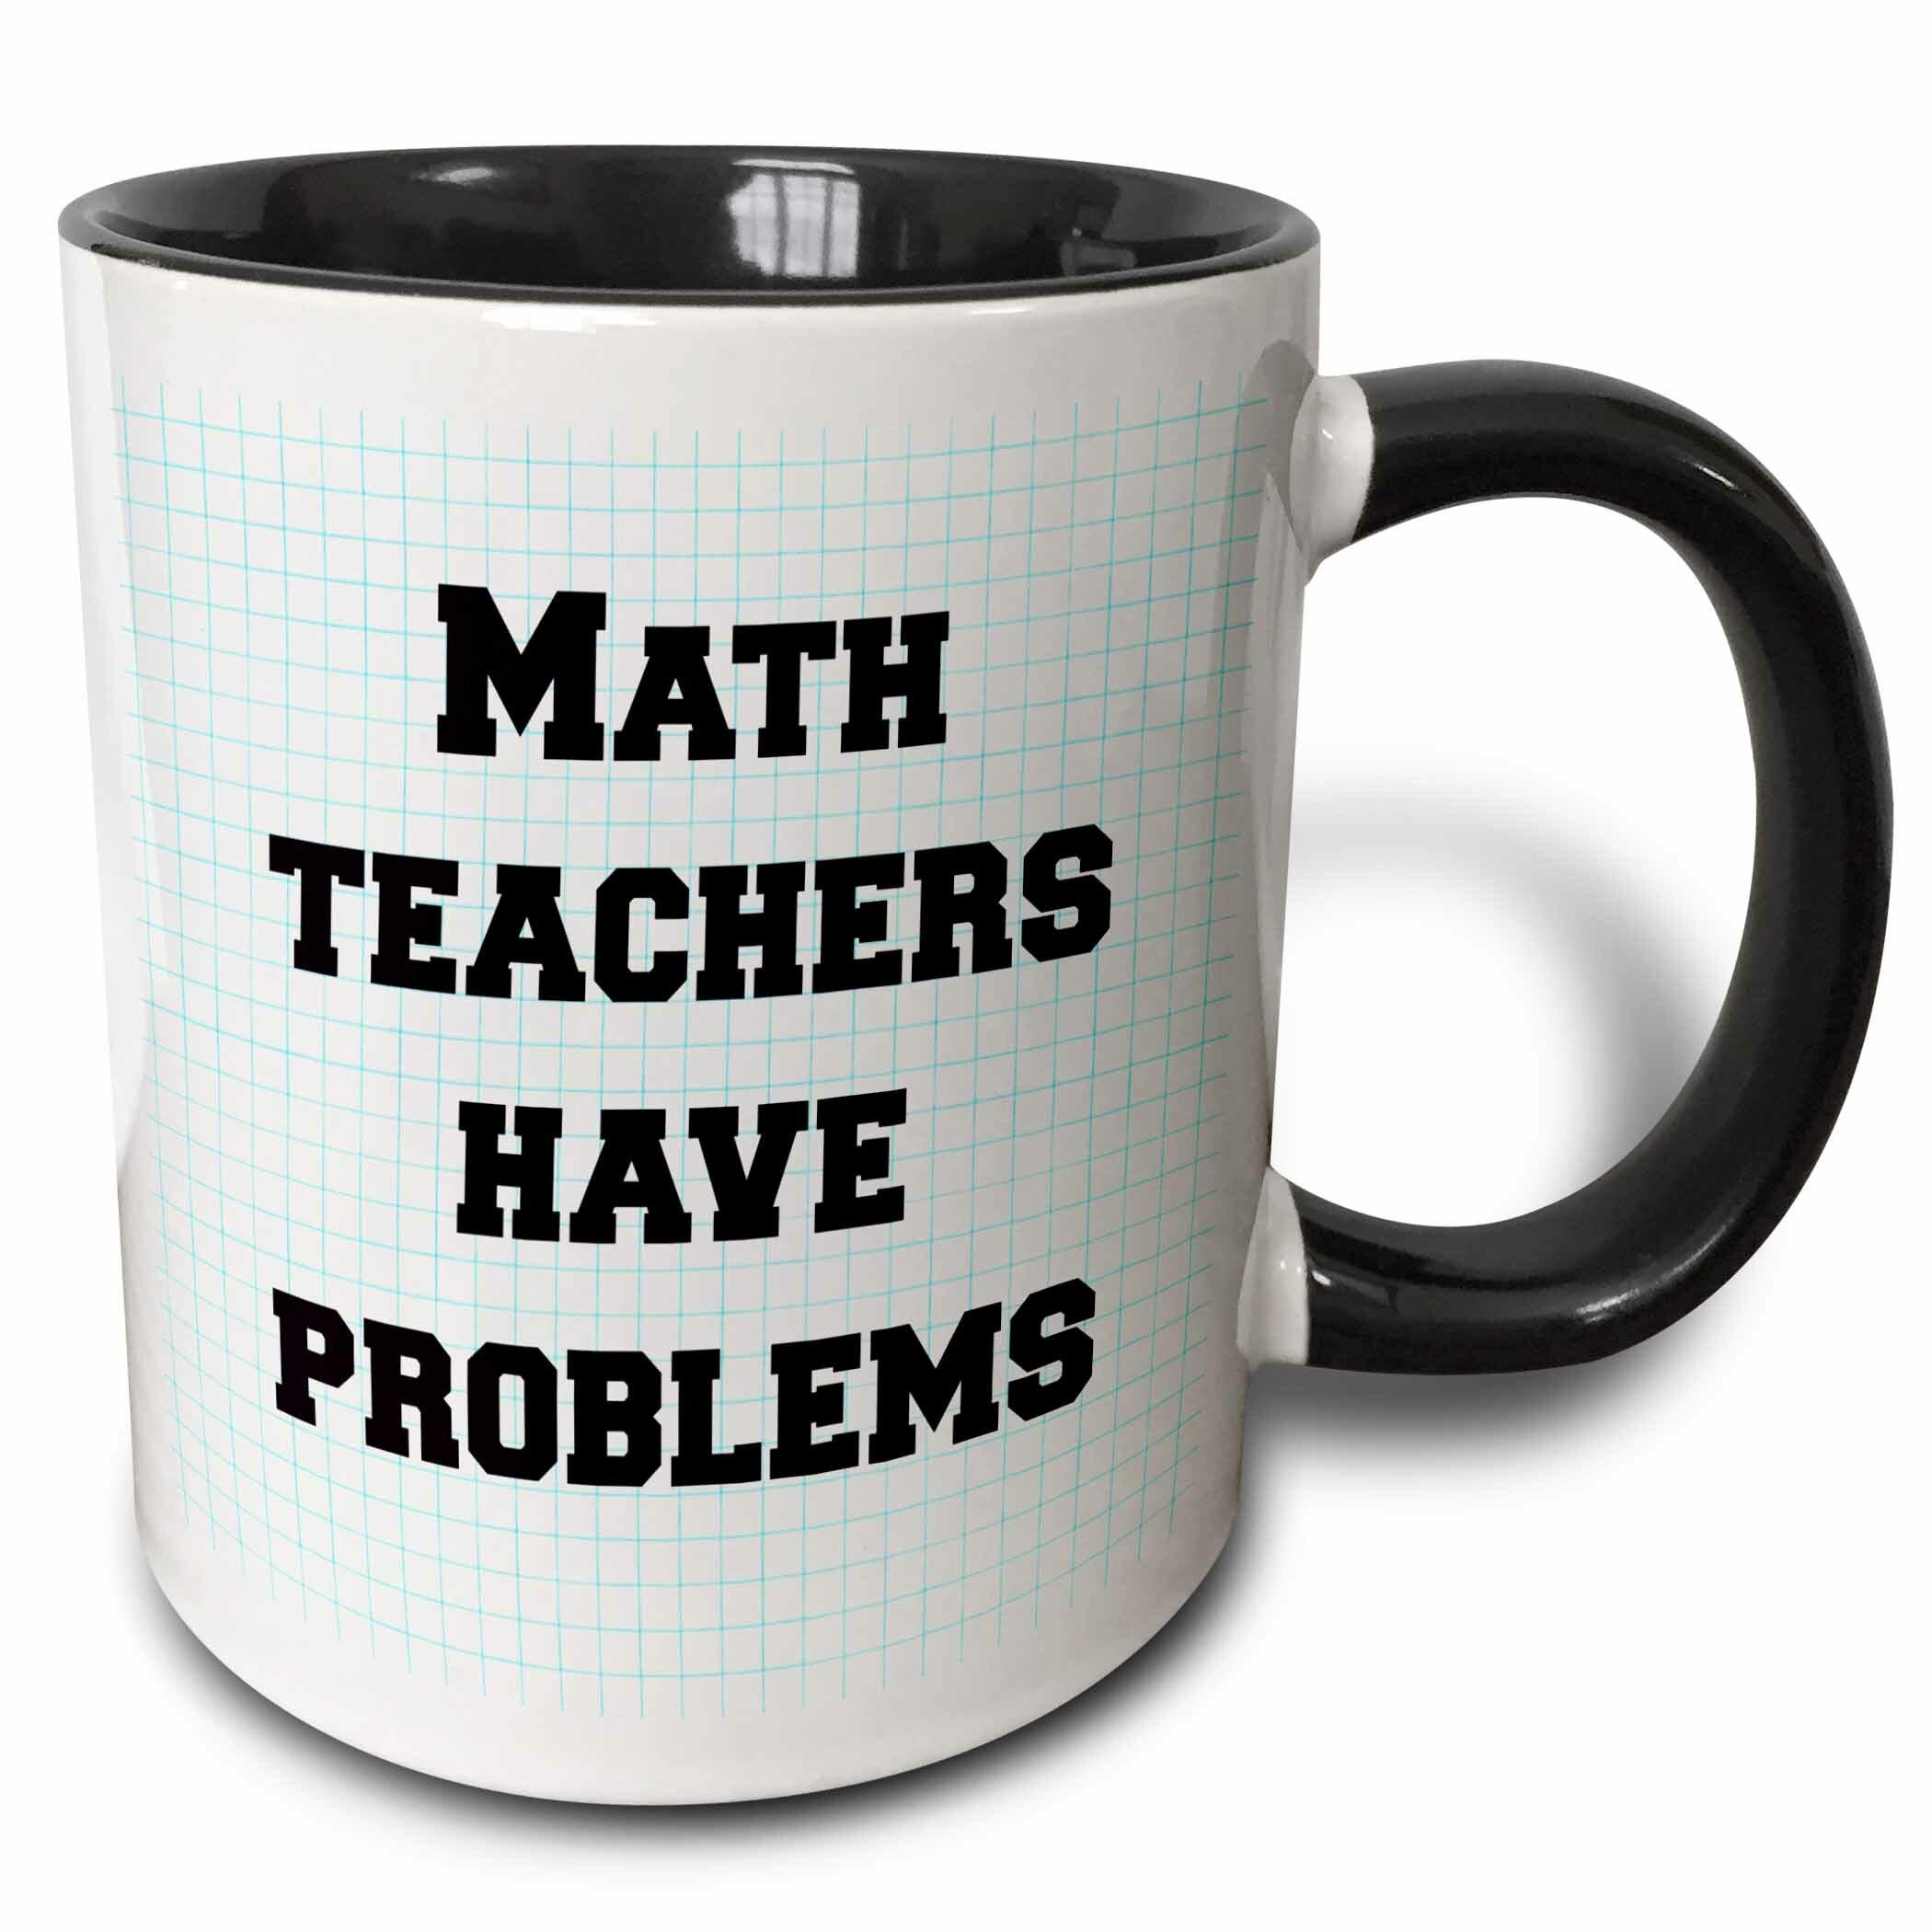 2c3afb7c635 East Urban Home Math Teachers Have Problems Coffee Mug | Wayfair